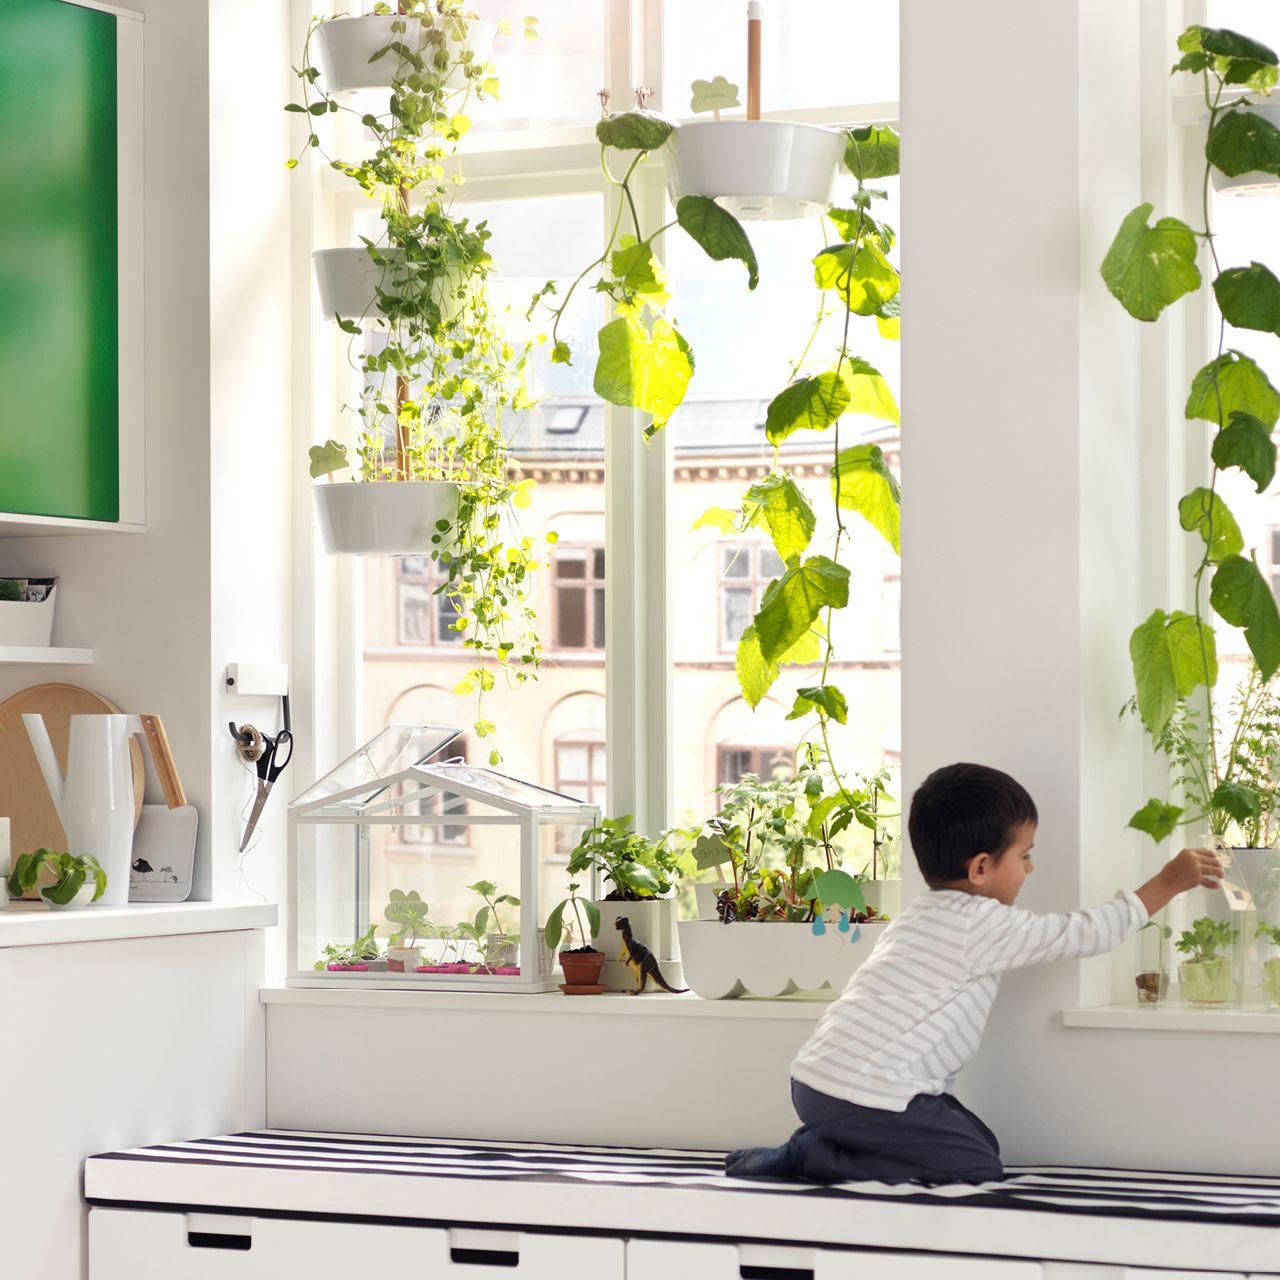 Socker greenhouse white inoutdoor apartment ideas apartments